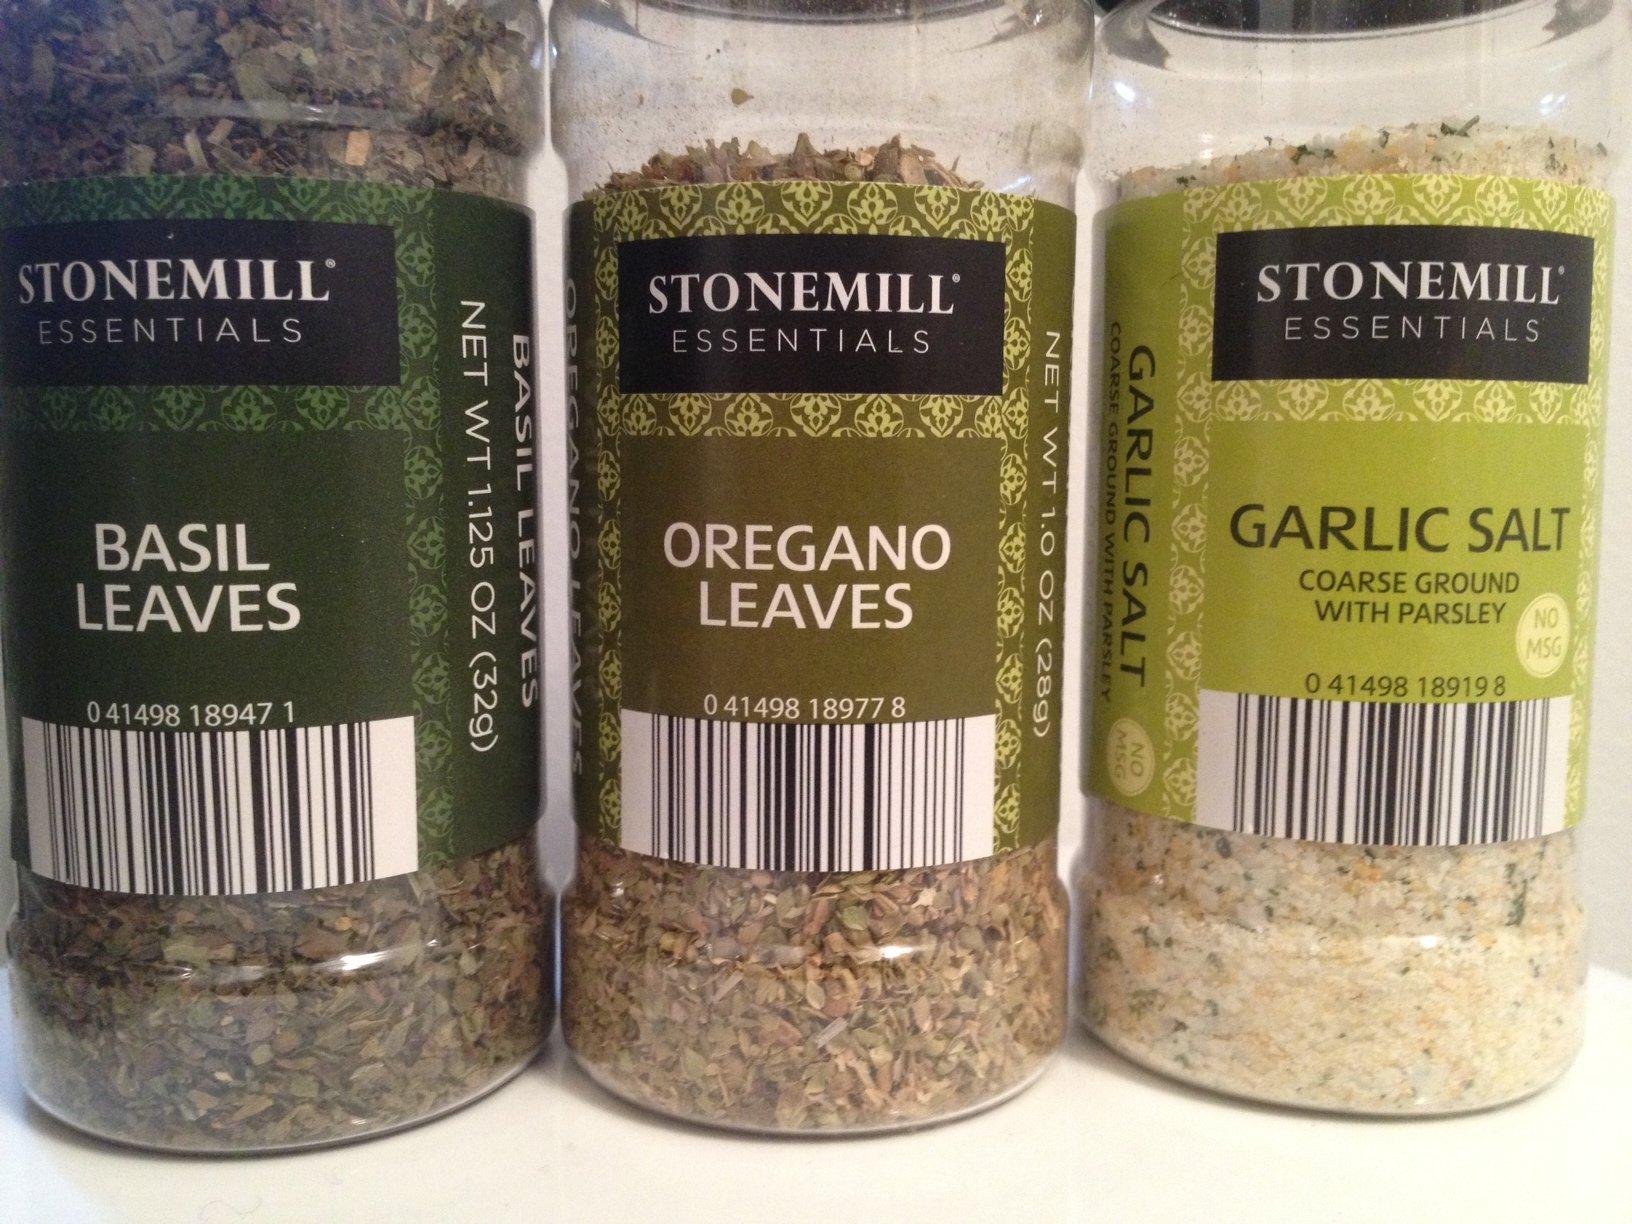 Three Pack - Basil, Oregano, & Garlic Salt by Stonemill Essentials